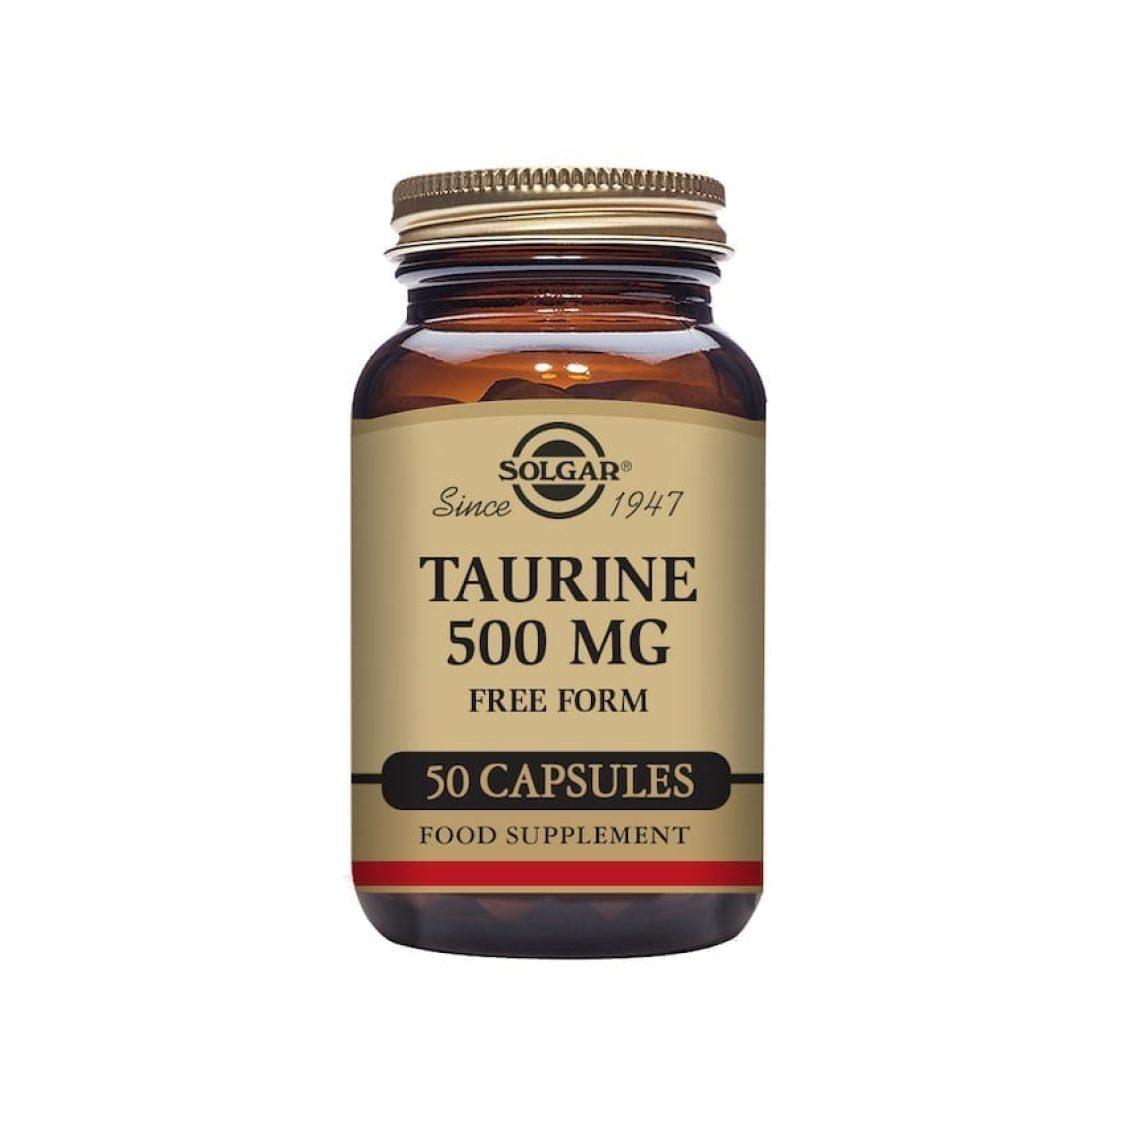 Solgar - Free Form Amino Acids - Taurine 500mg Vegicaps - Size: 50